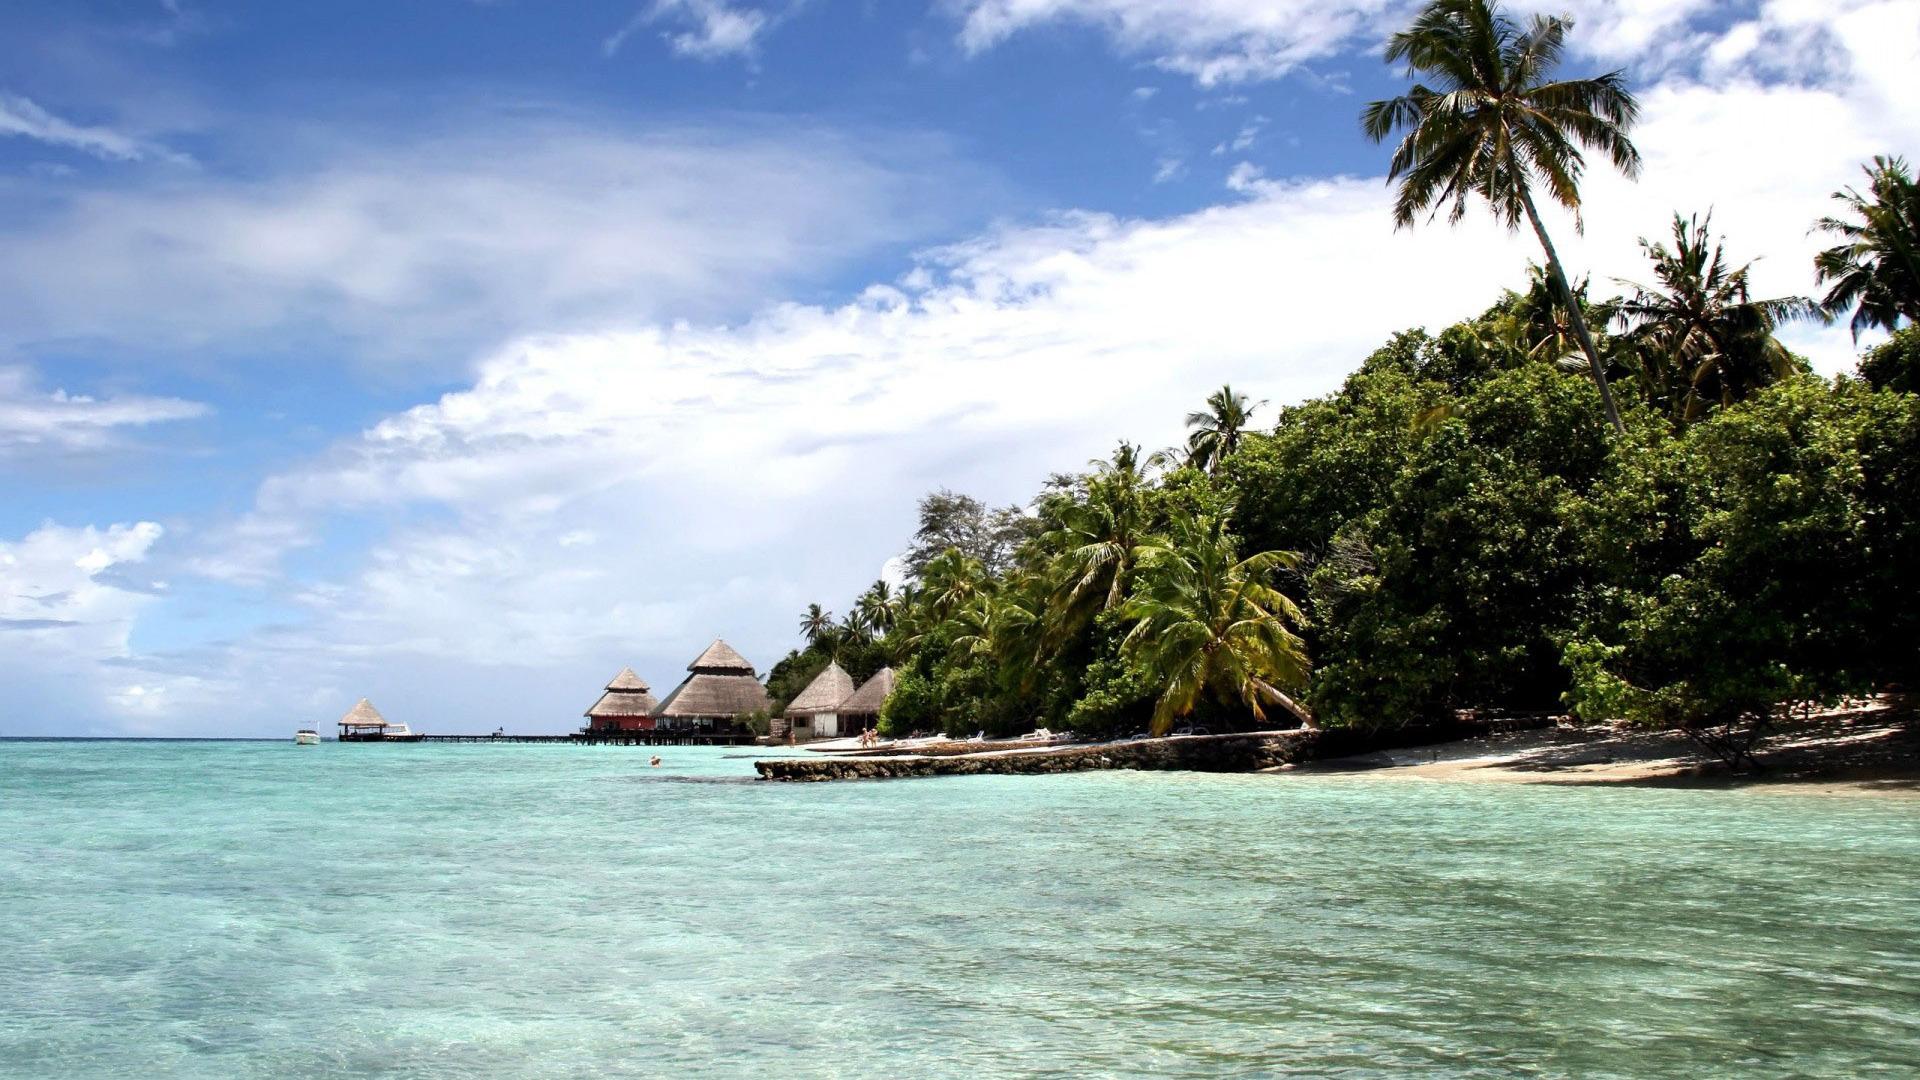 Tropical island wallpaper 10130 1728x1080